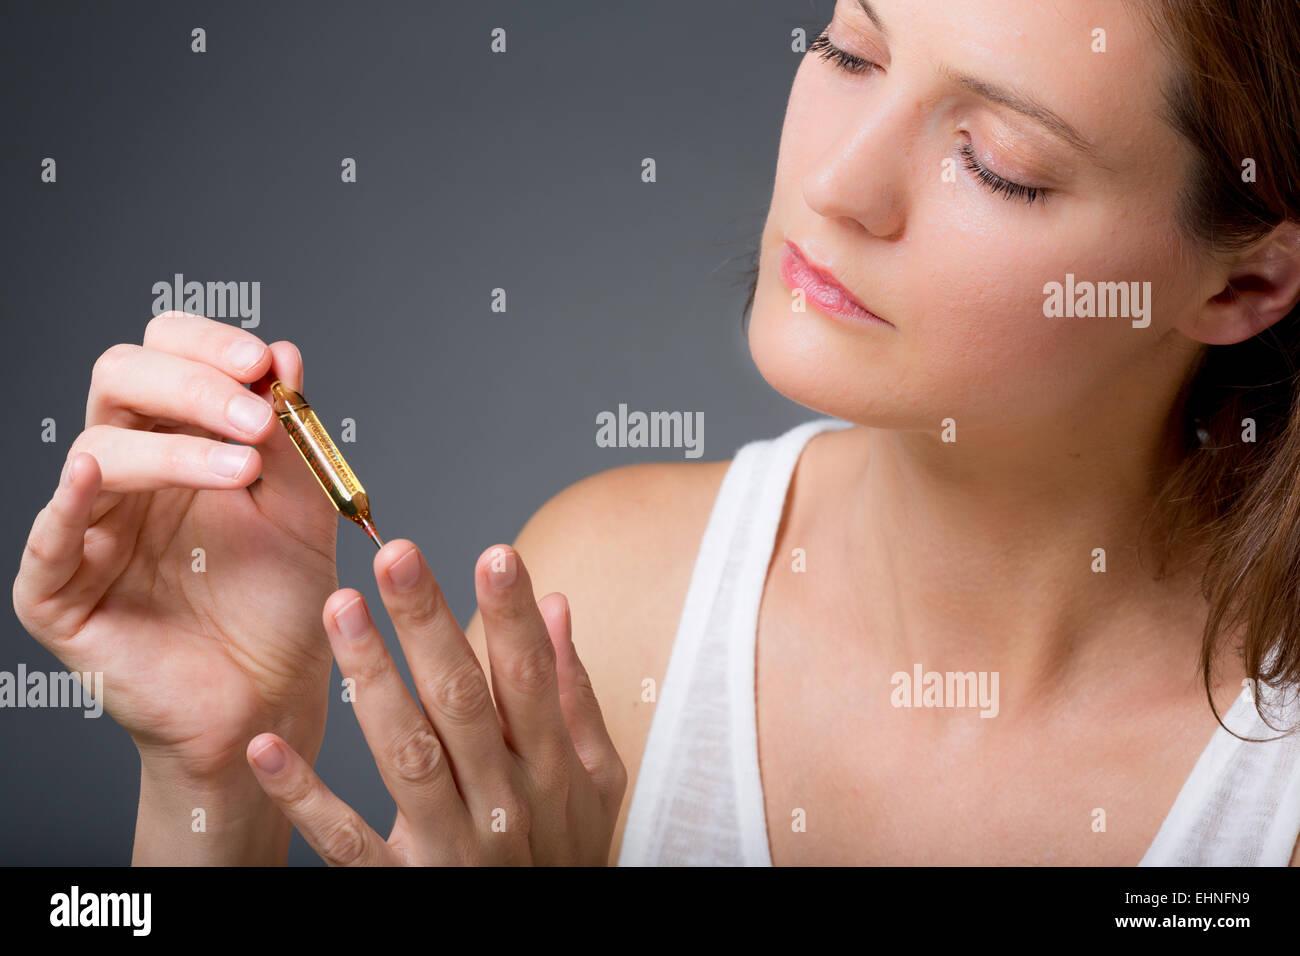 Frau, die Glasampulle von Vitamin d. Stockbild